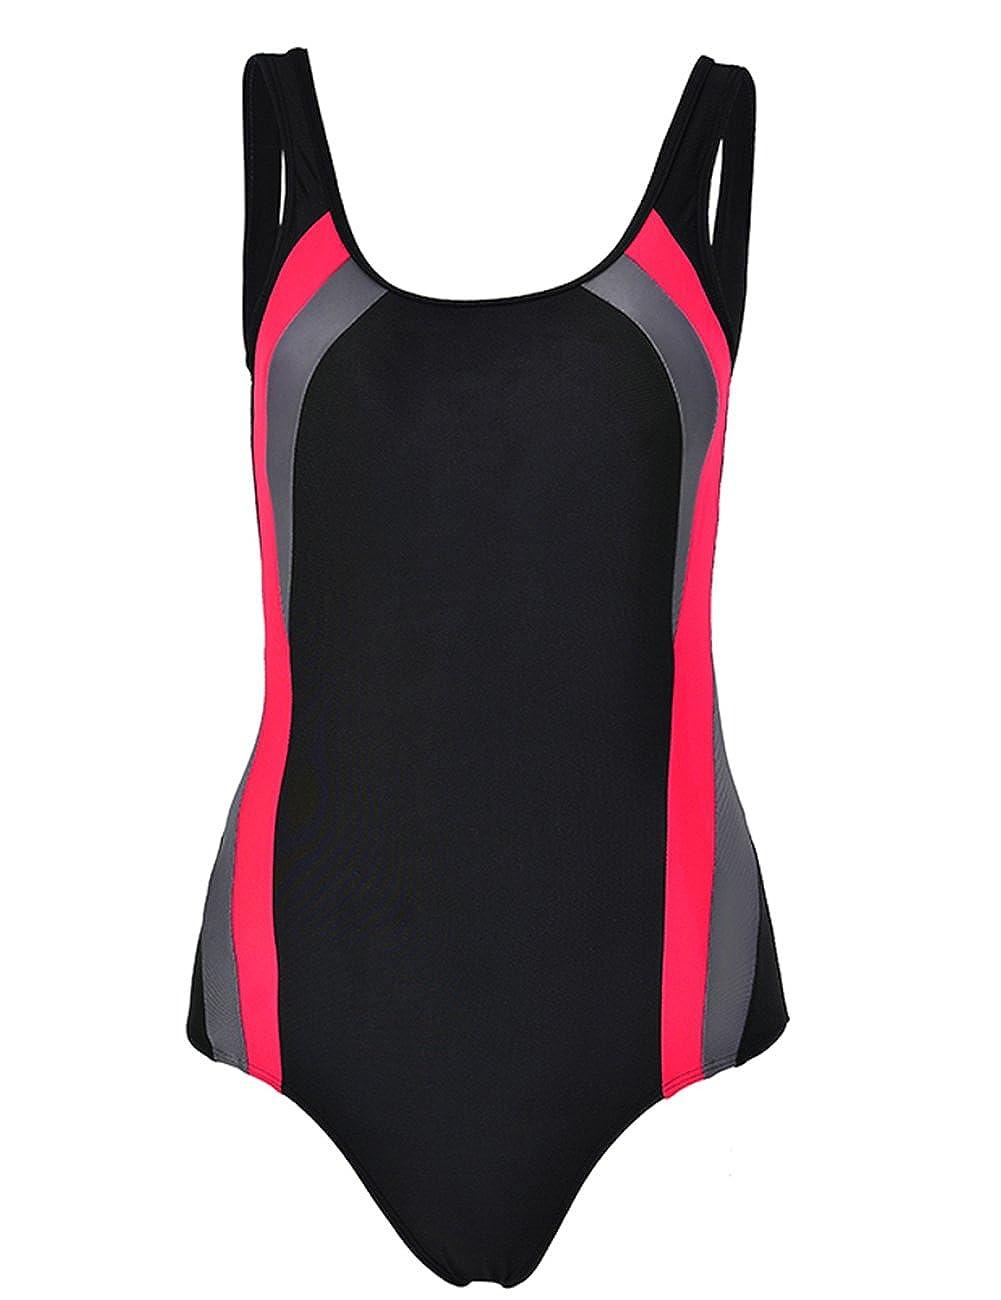 RIBIKA Women Push Up Bikini Set One Pieces Swimsuit Beachwear Bathing Suit